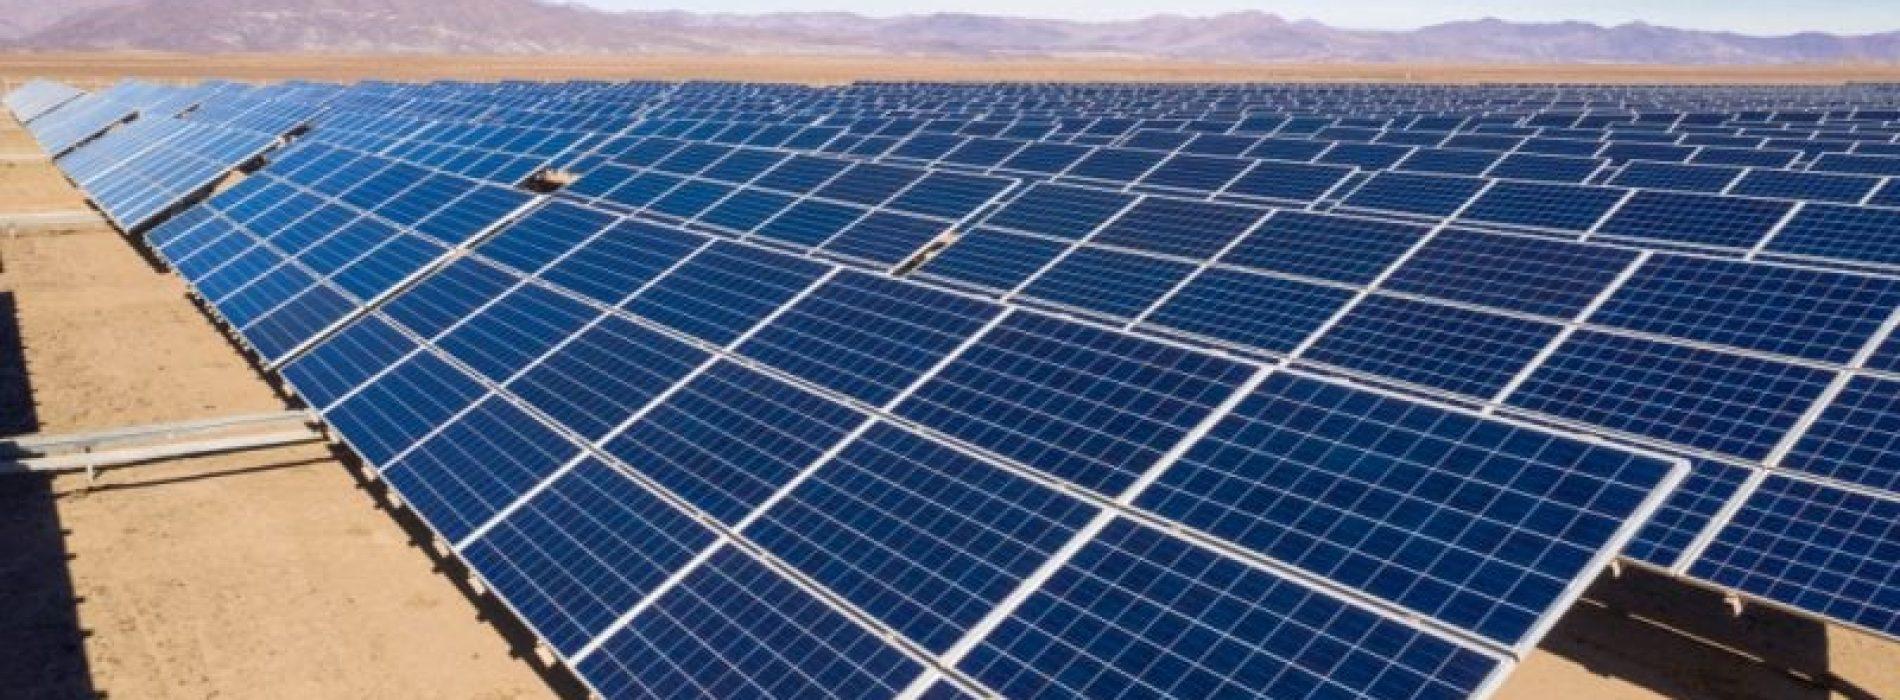 NAMIBIA: Windhoek cerca IPP per produrre 25 MWp di energia solare